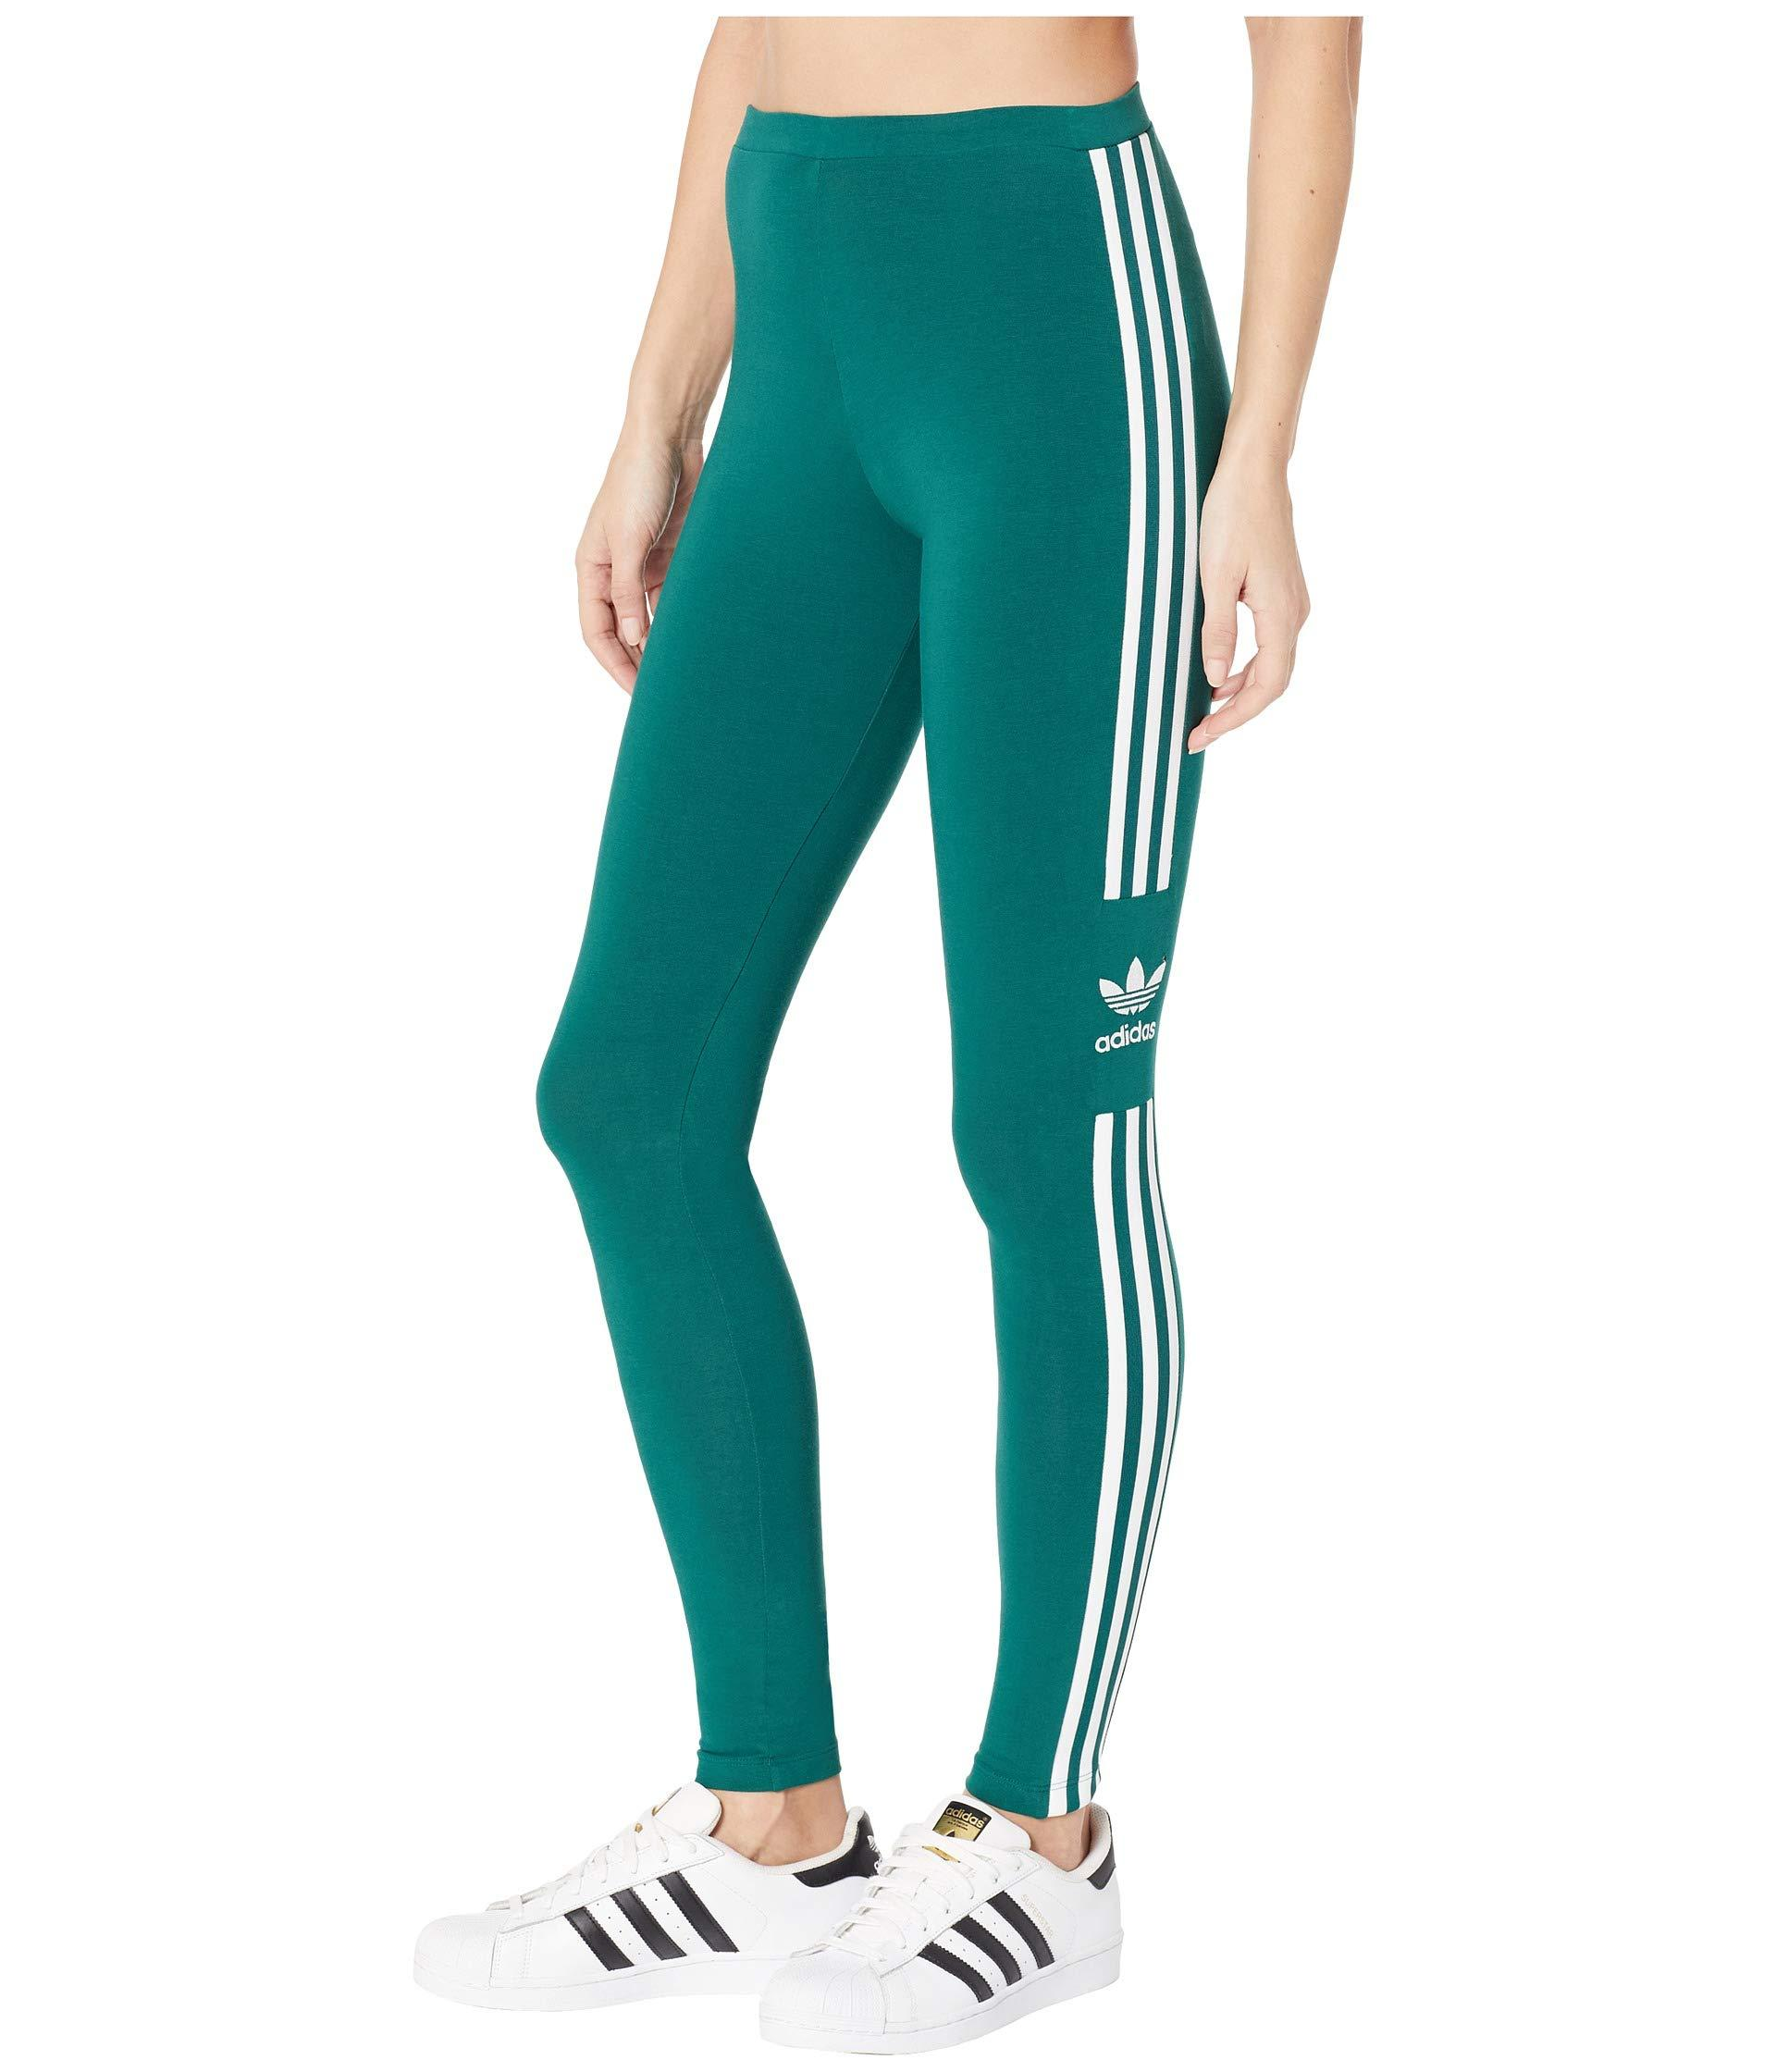 46f159a139e07f adidas Originals Trefoil Tights (black 1) Women's Workout in Green ...